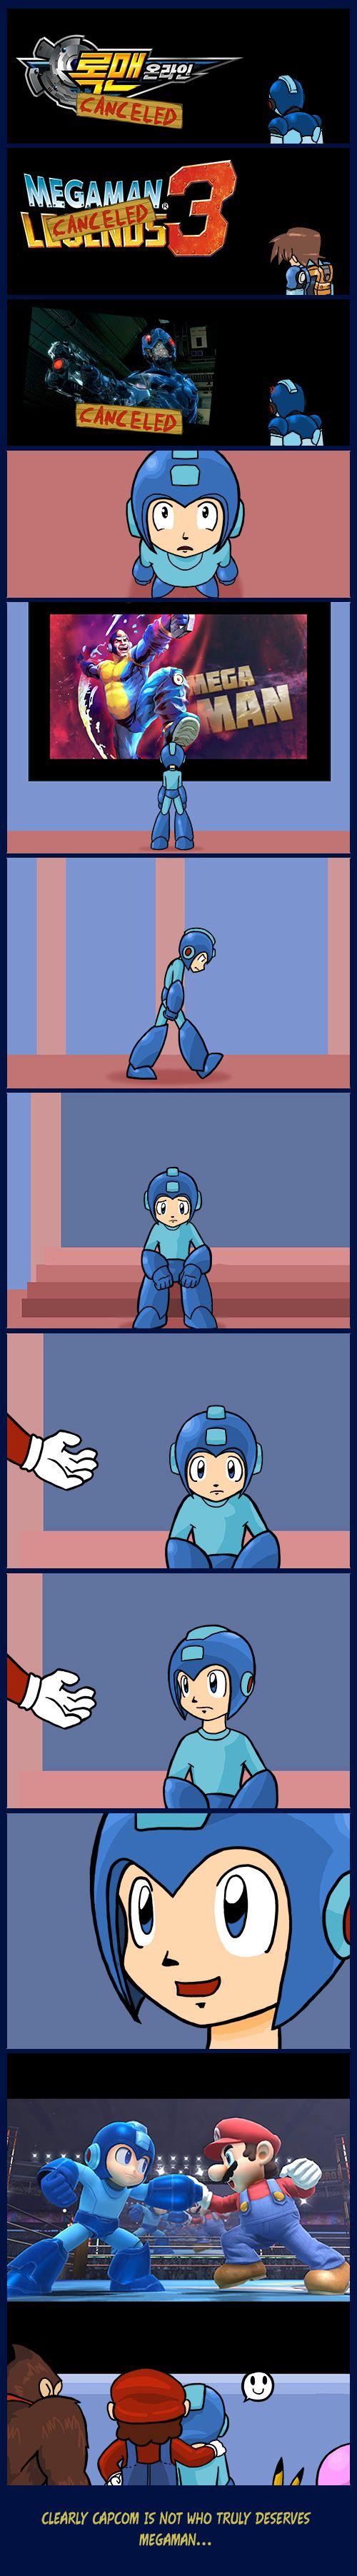 One for Megaman by ~Camilo-sama on deviantART